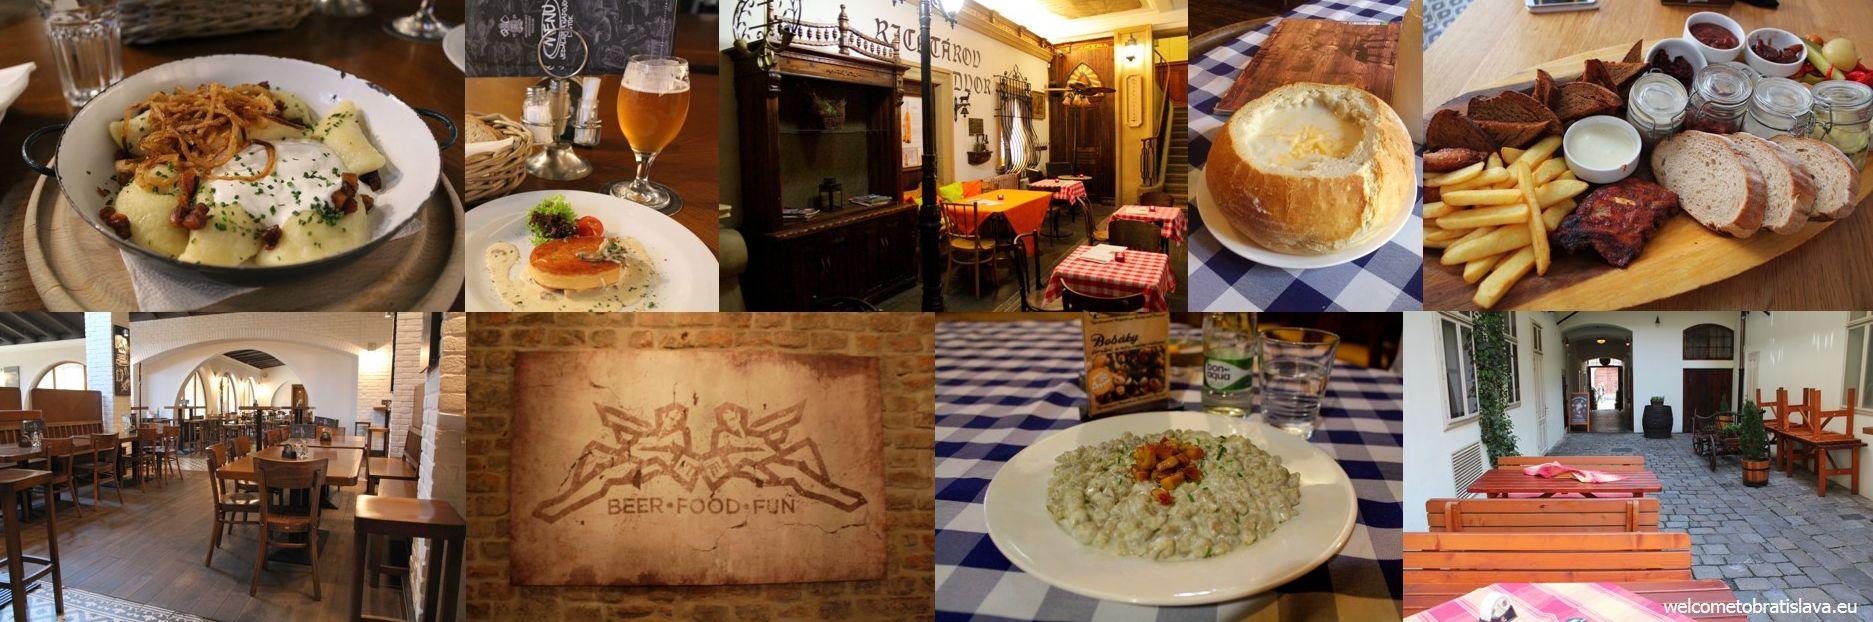 Slovak pubs in Bratislava